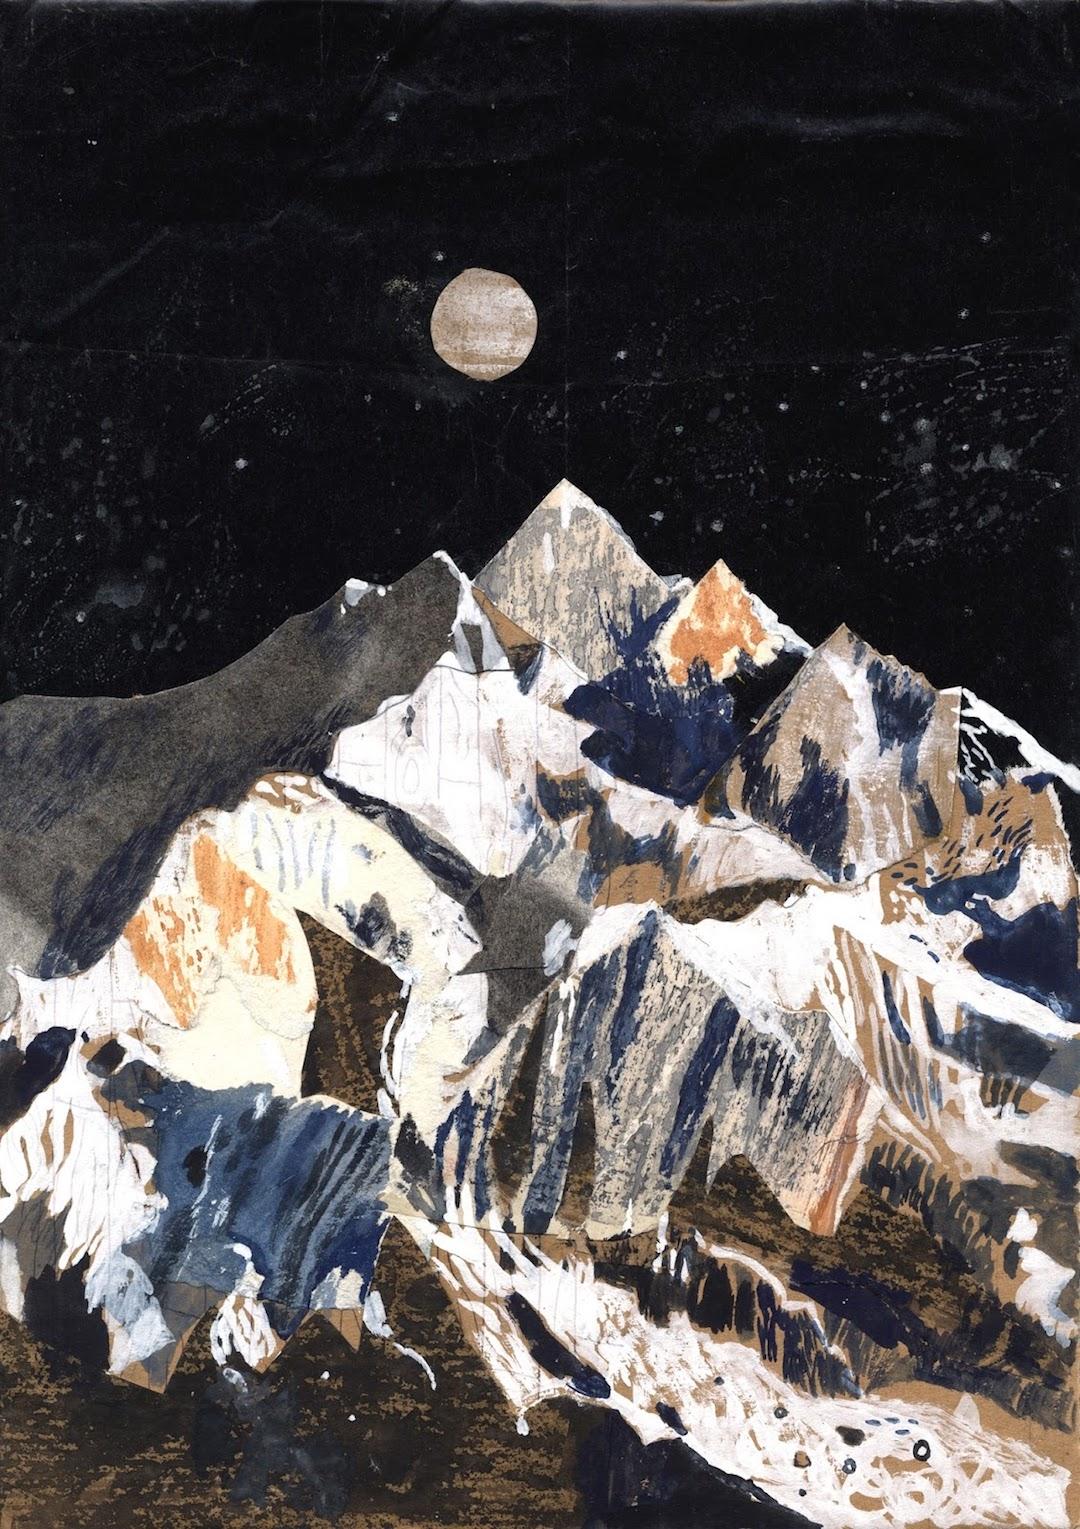 Collage art illustration by Chris Hagan